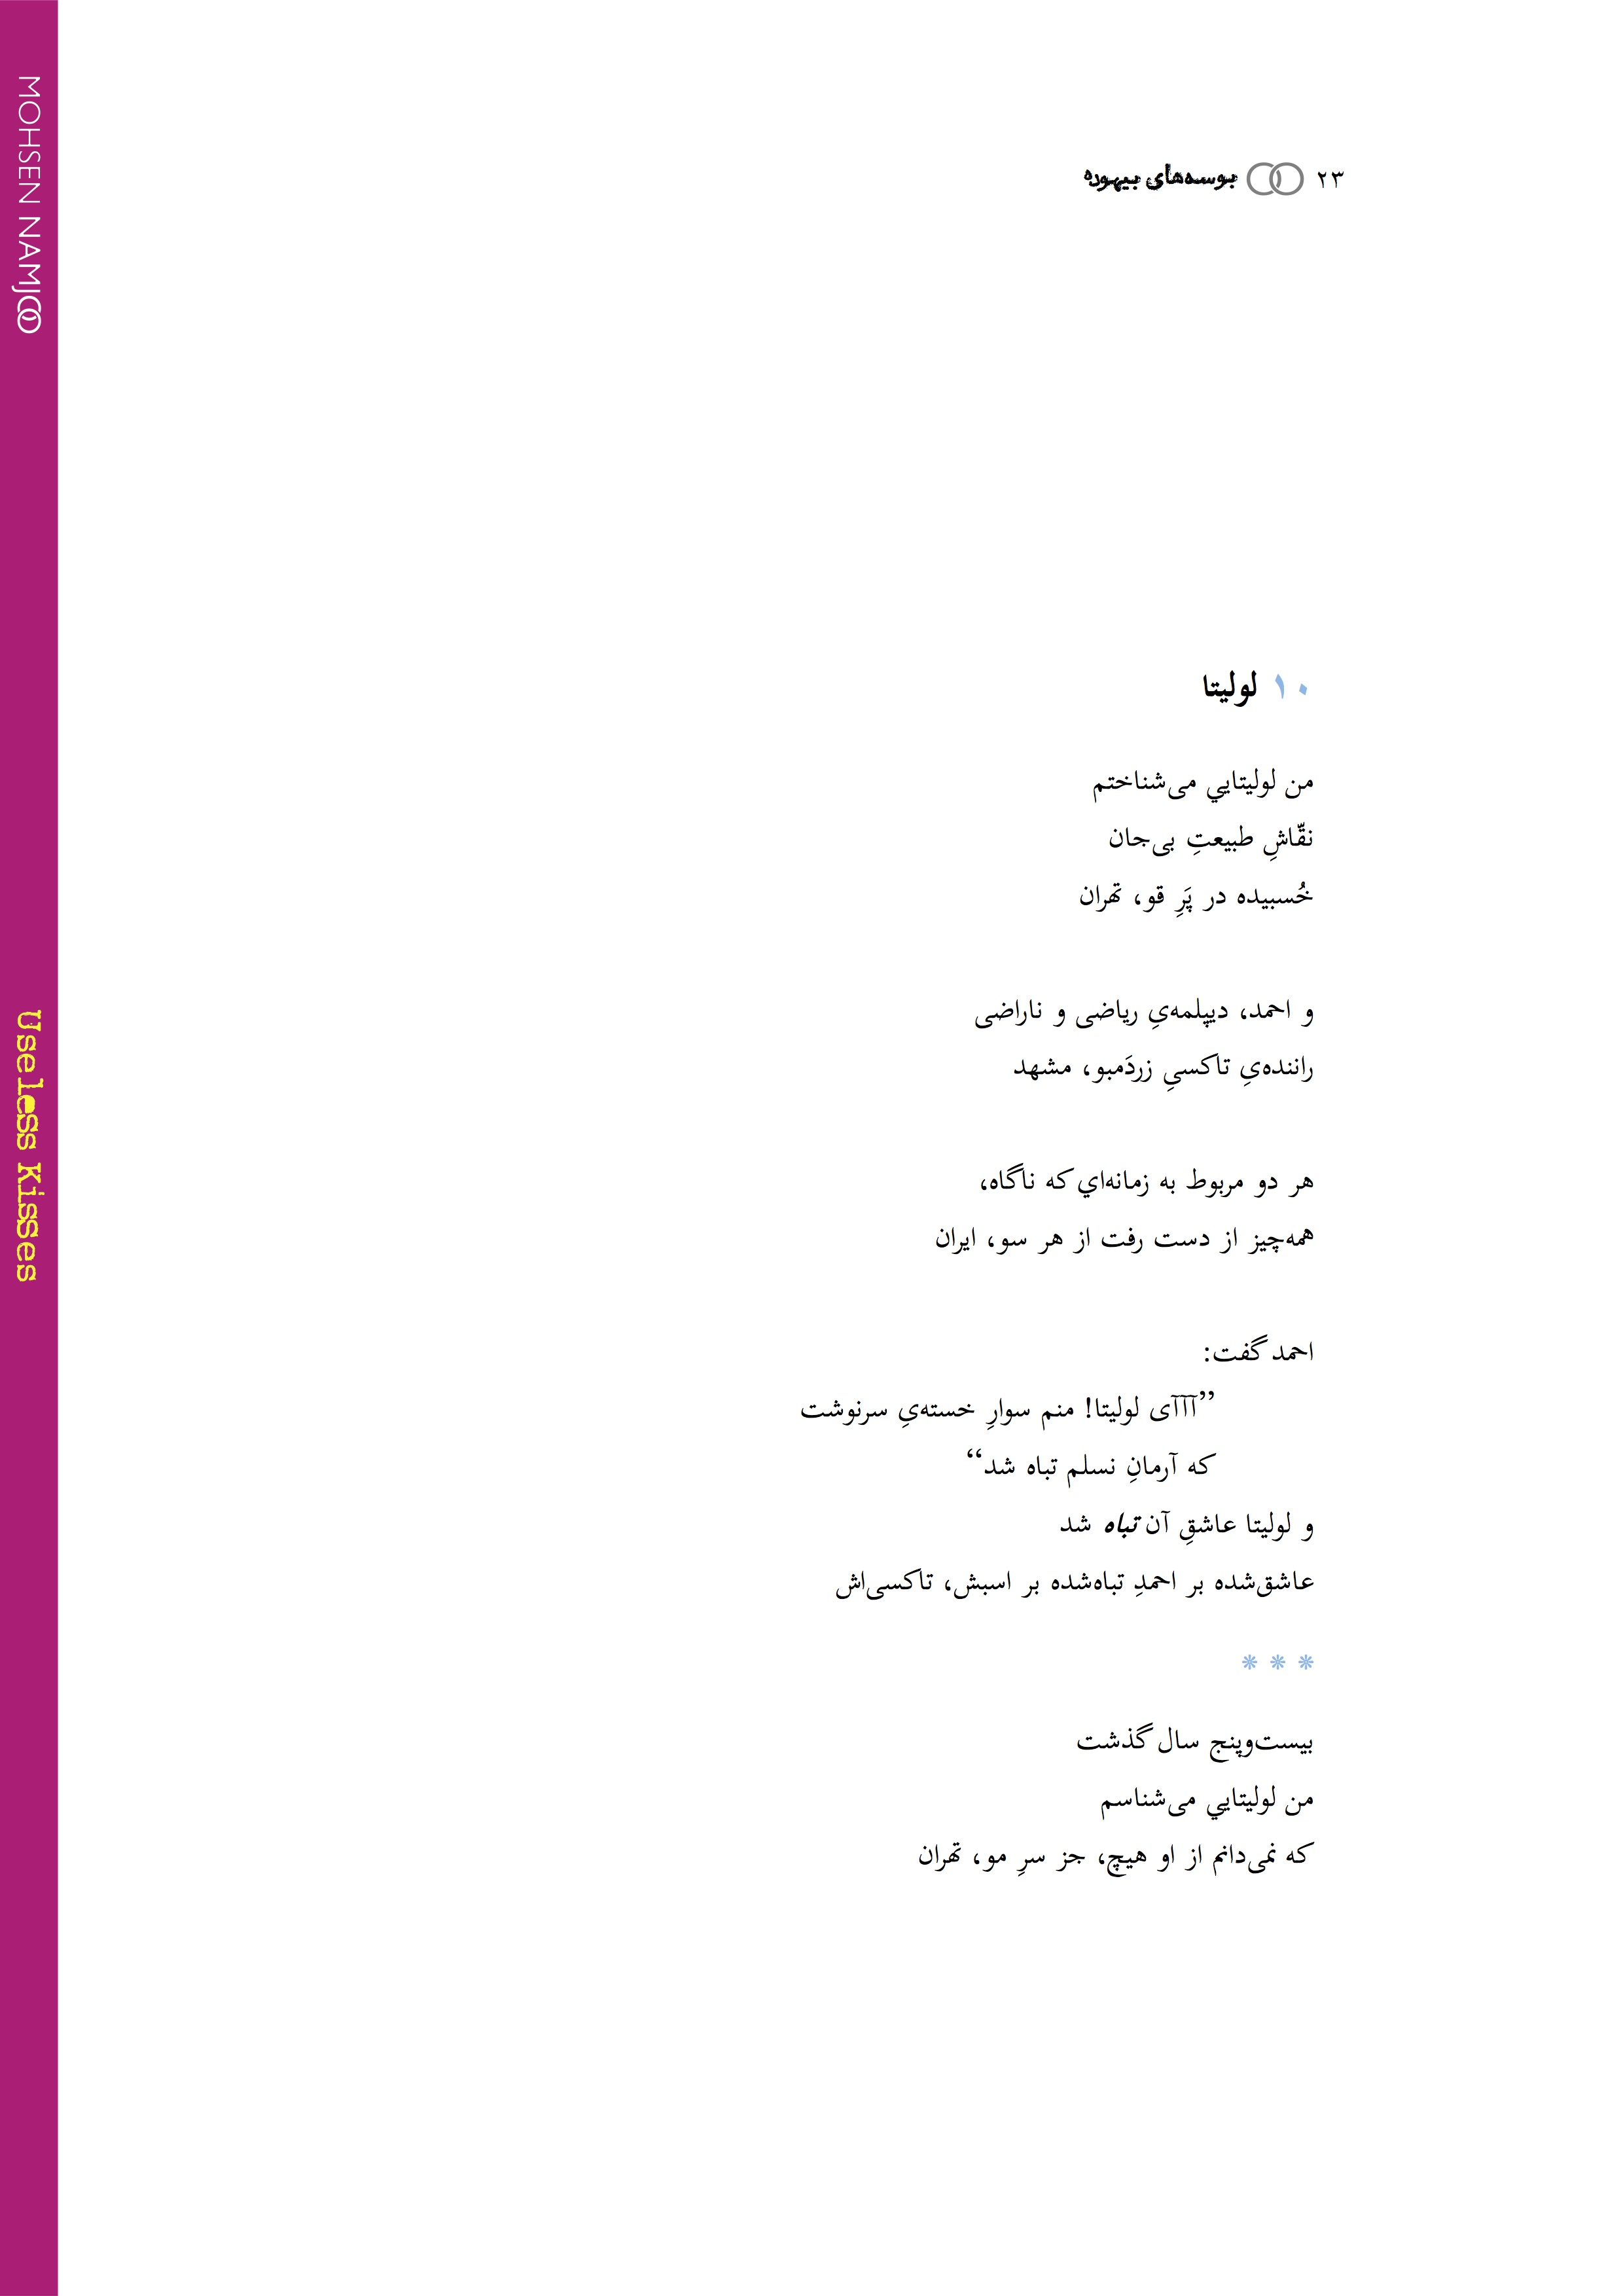 22Useless Kisses eBook (2nd Edition).jpg